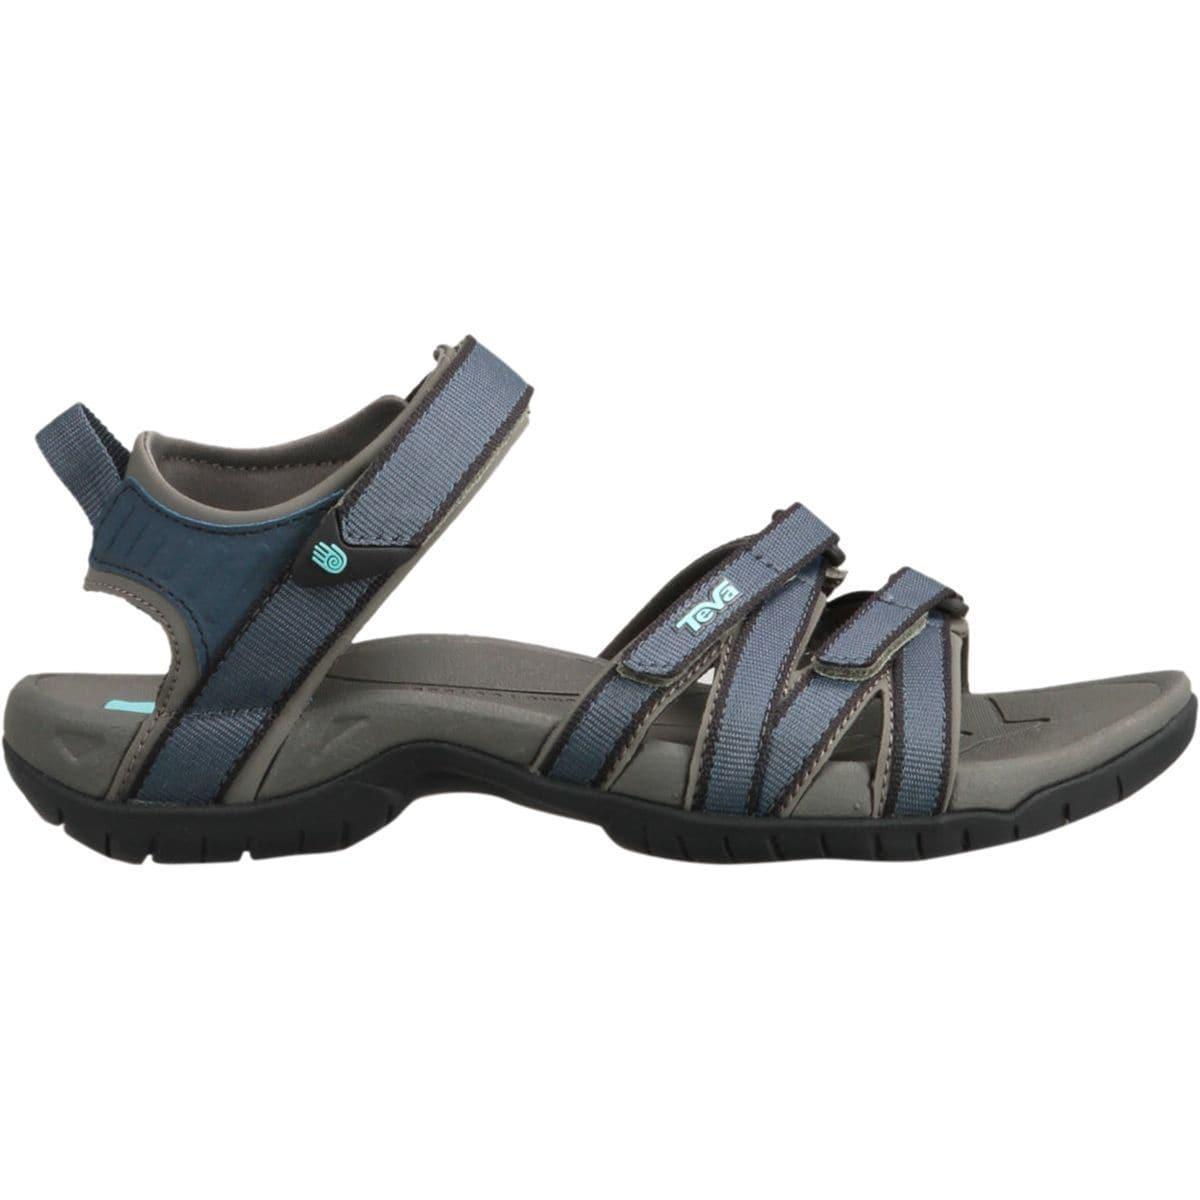 127a42e81f97 Teva Tirra 4266 Bering Sea Womens Sport Sandals Size 11m for sale ...